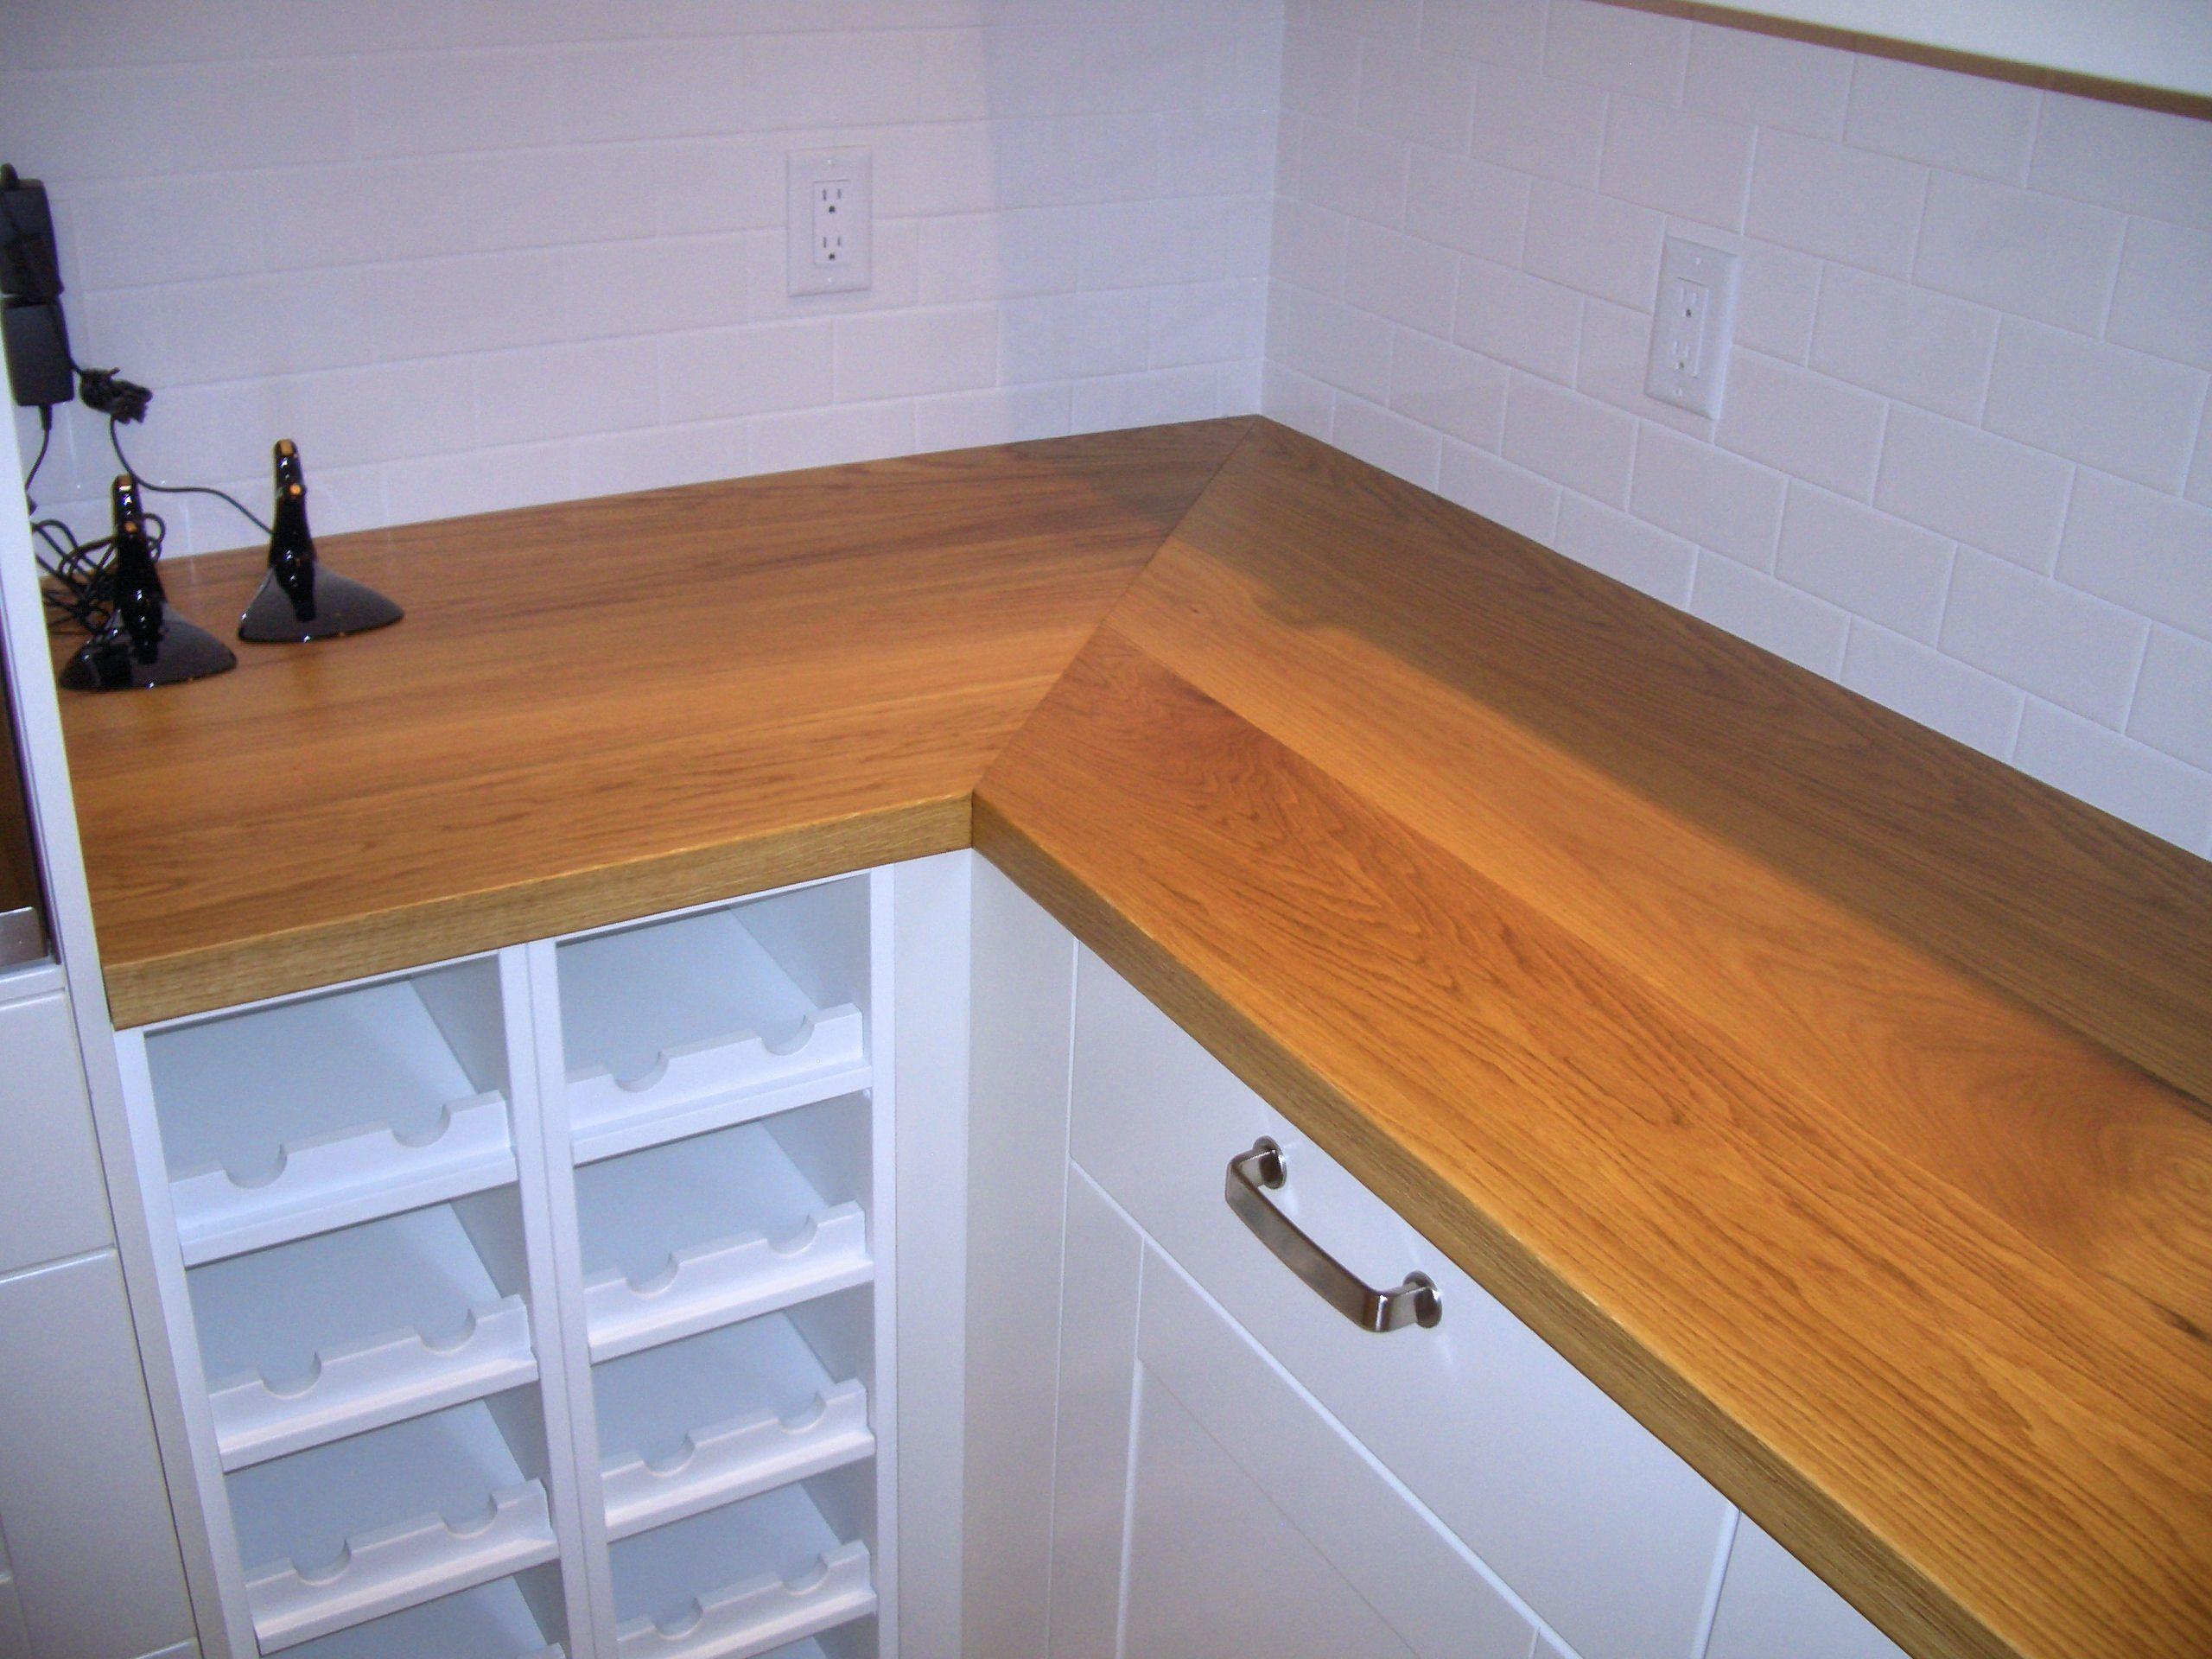 black door for concrete wood countertops top bamboo bar block countertop kitchen extraordinary hardwood counter sale tops french refrigerator depth butcher wooden surface oak